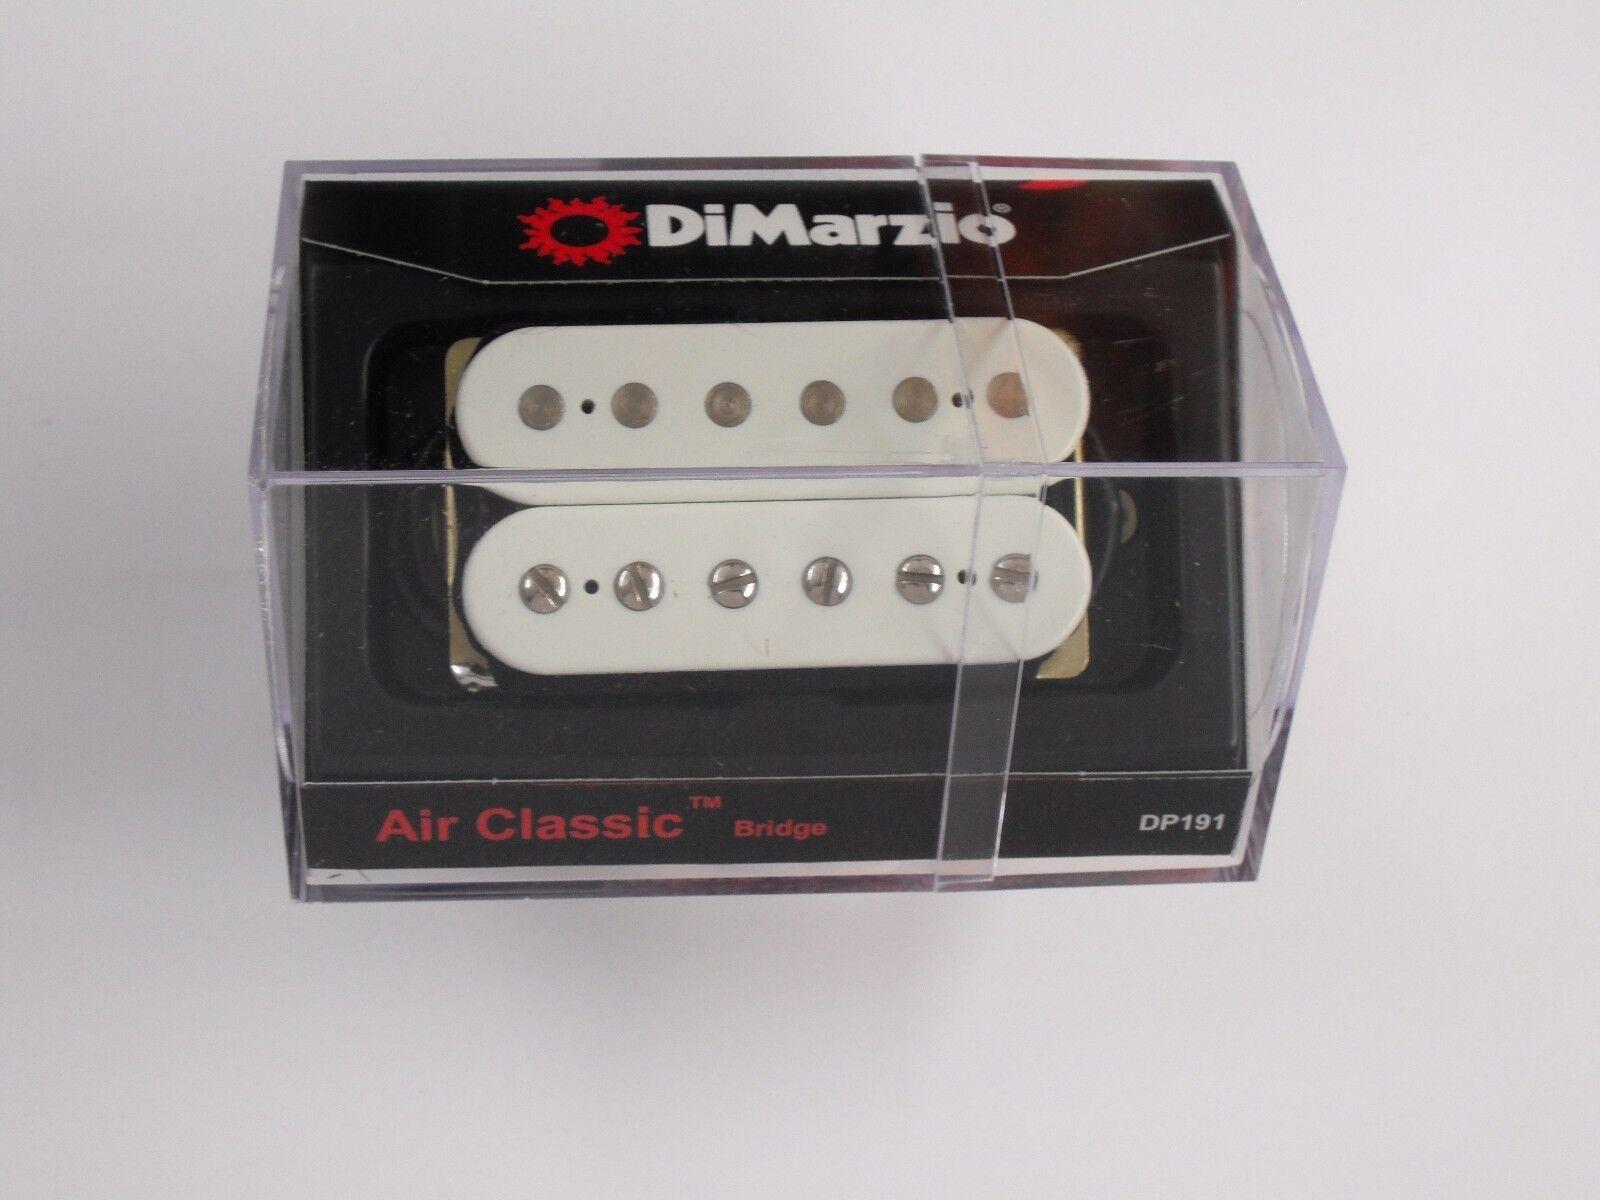 Dimarzio Air Classic Bridge regular regular regular espaciados Humbucker blancoo con postes de Cromo DP 191 58d975